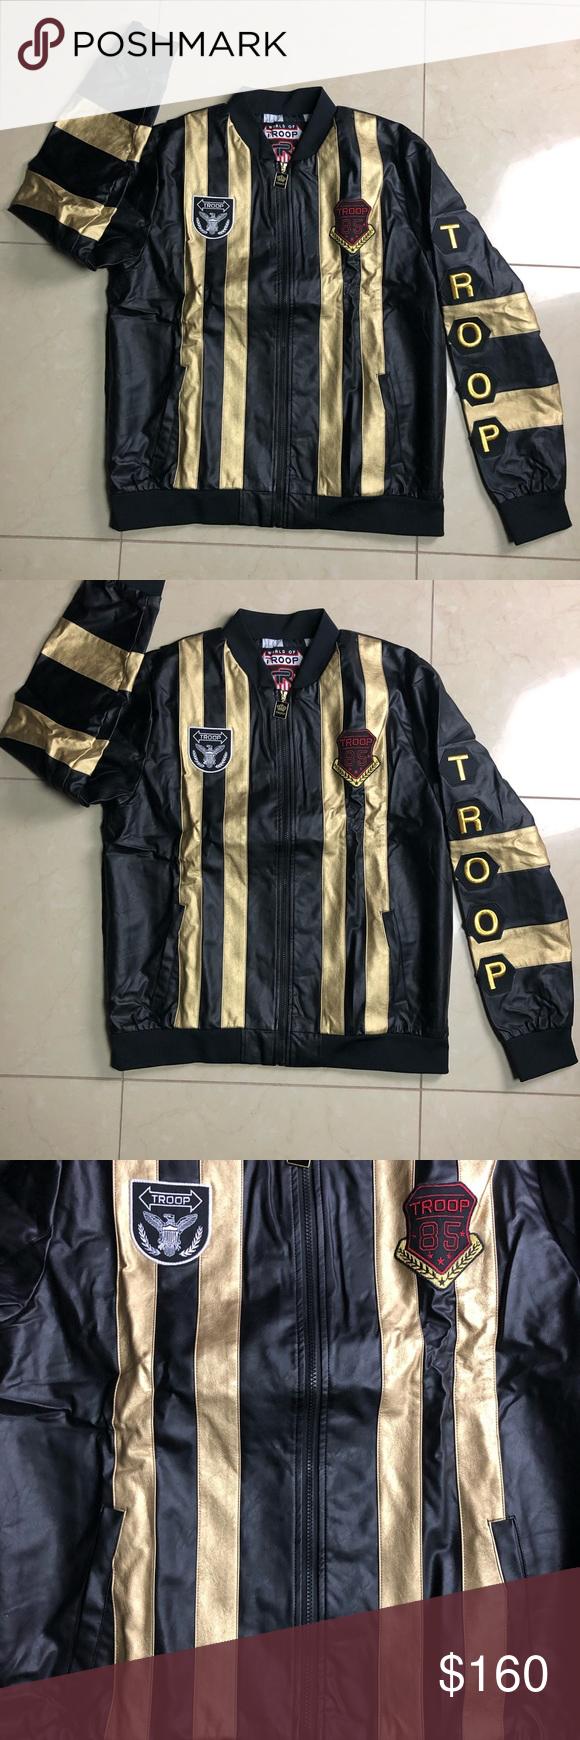 Troop Black Gold Jacket Size Xxl Black And Gold Jacket Gold Jacket Jackets [ 1740 x 580 Pixel ]